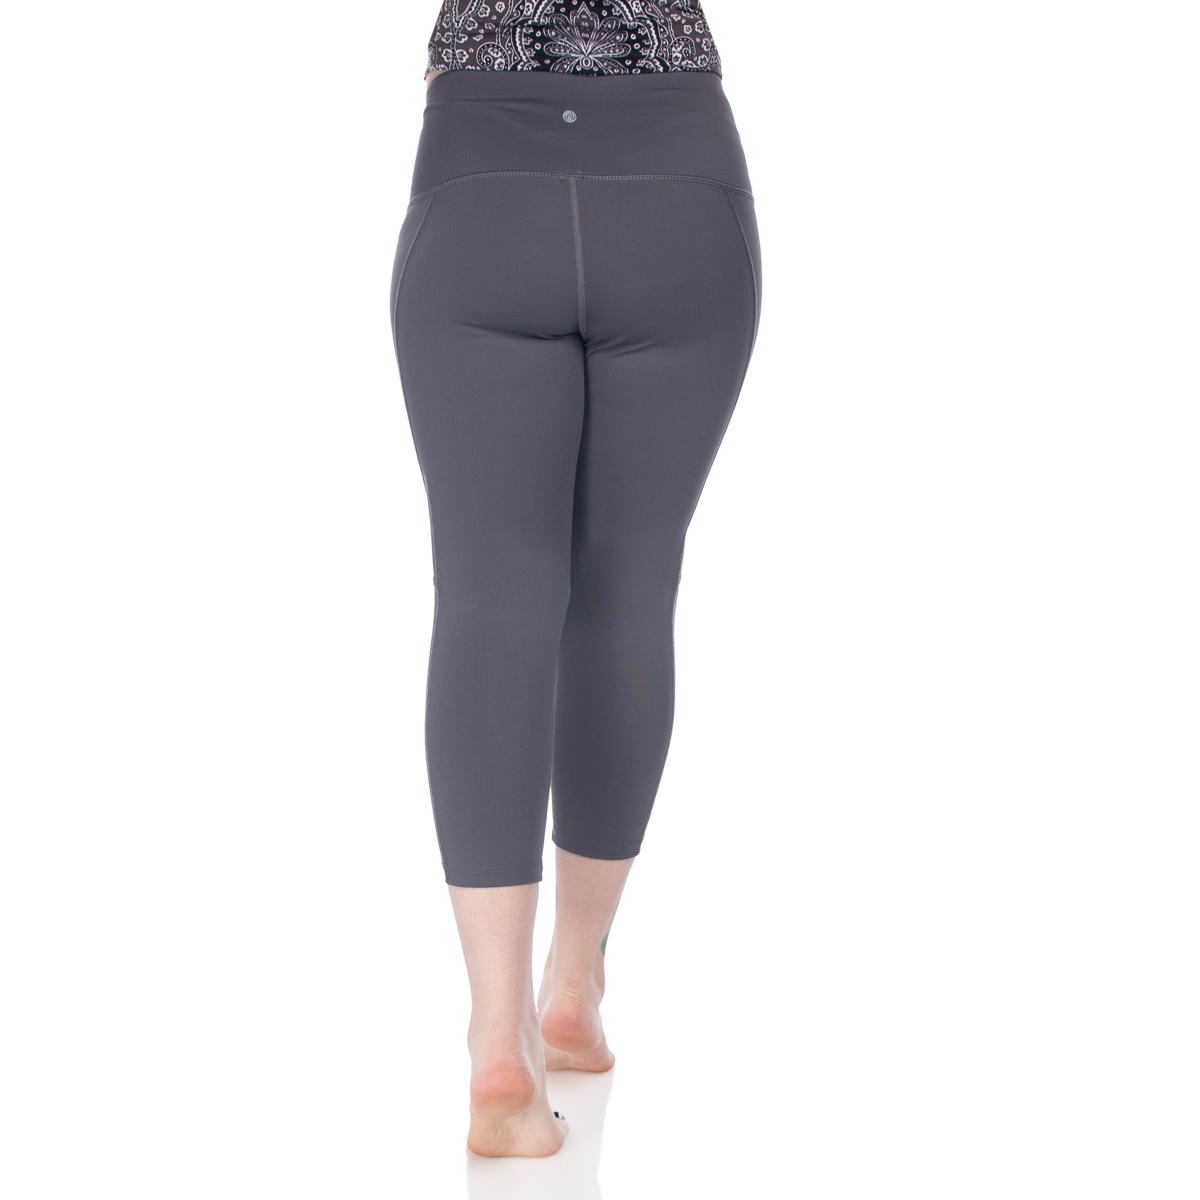 7-8-Length-High-Waist-Moisture-Wicking-UPF-50-Leggings-Run-Gym-Yoga-Pants-Mesh thumbnail 9